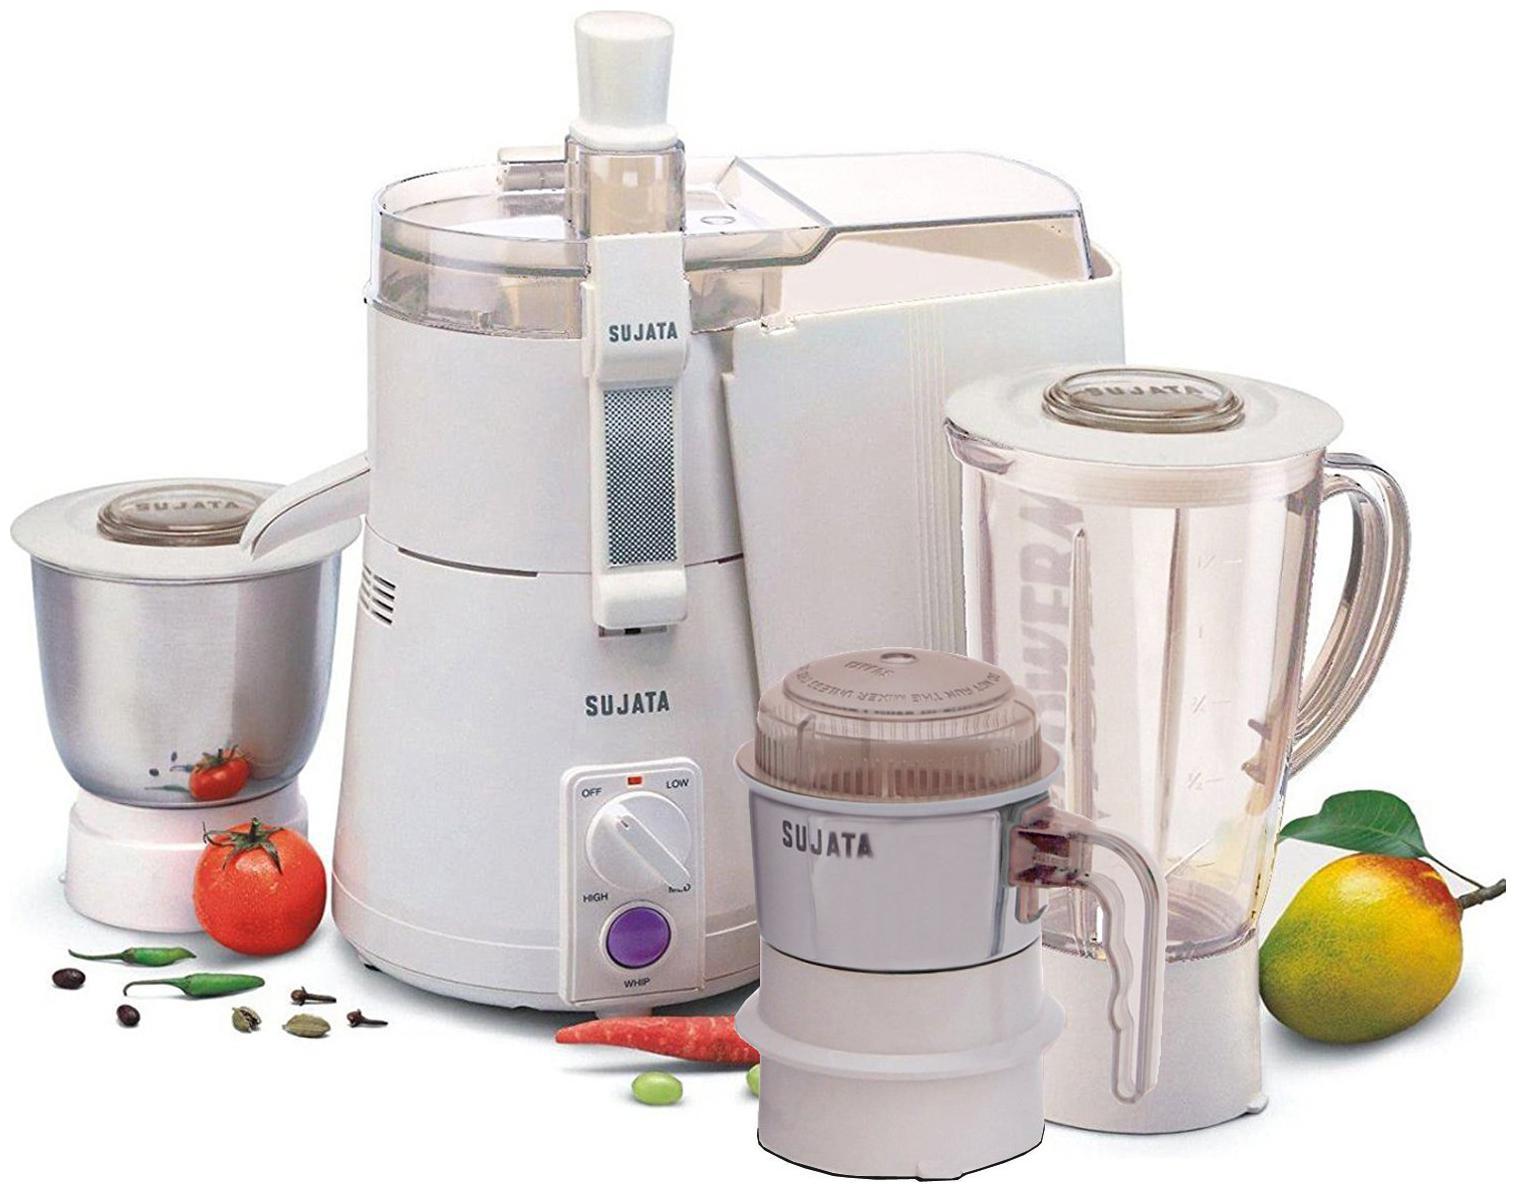 Sujata Powermatic Plus 900-Watt (With Chutney Jar) Juicer Mixer Grinder